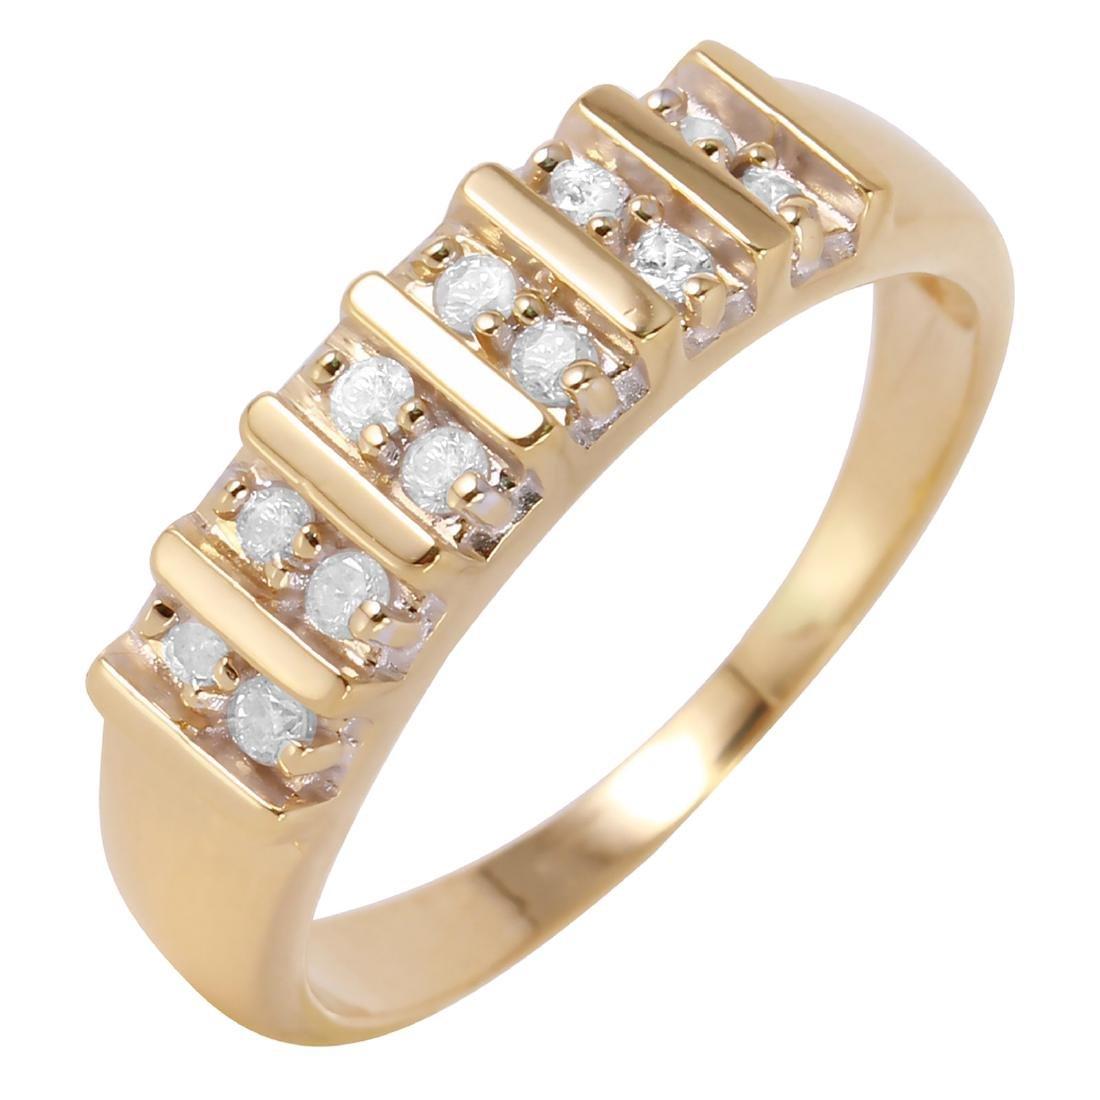 14KT Yellow Gold 0.22ctw Diamond Wedding Band Ring Size